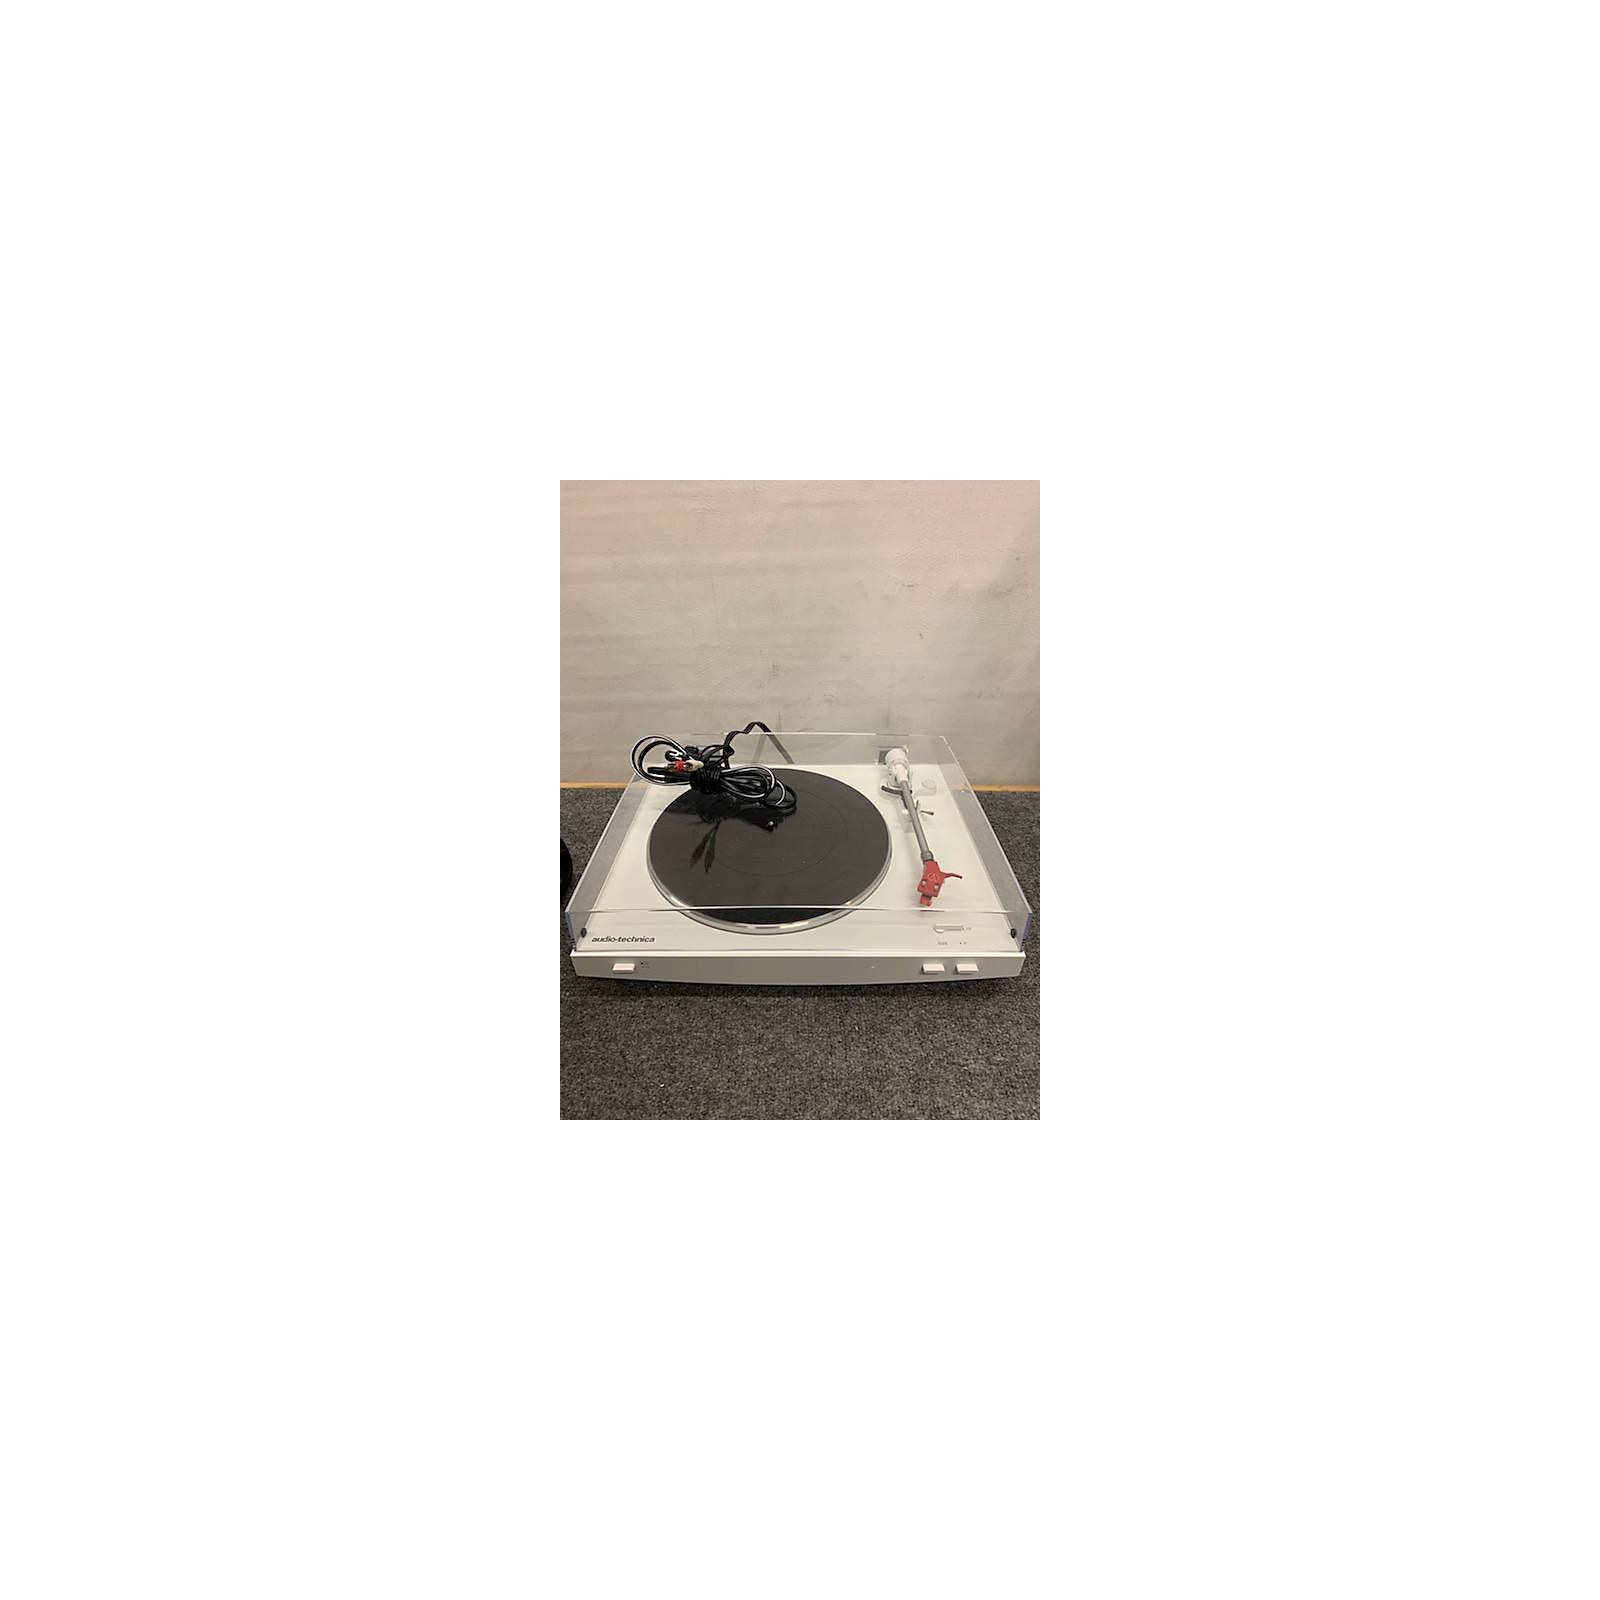 Audio-Technica ATLP3 Record Player